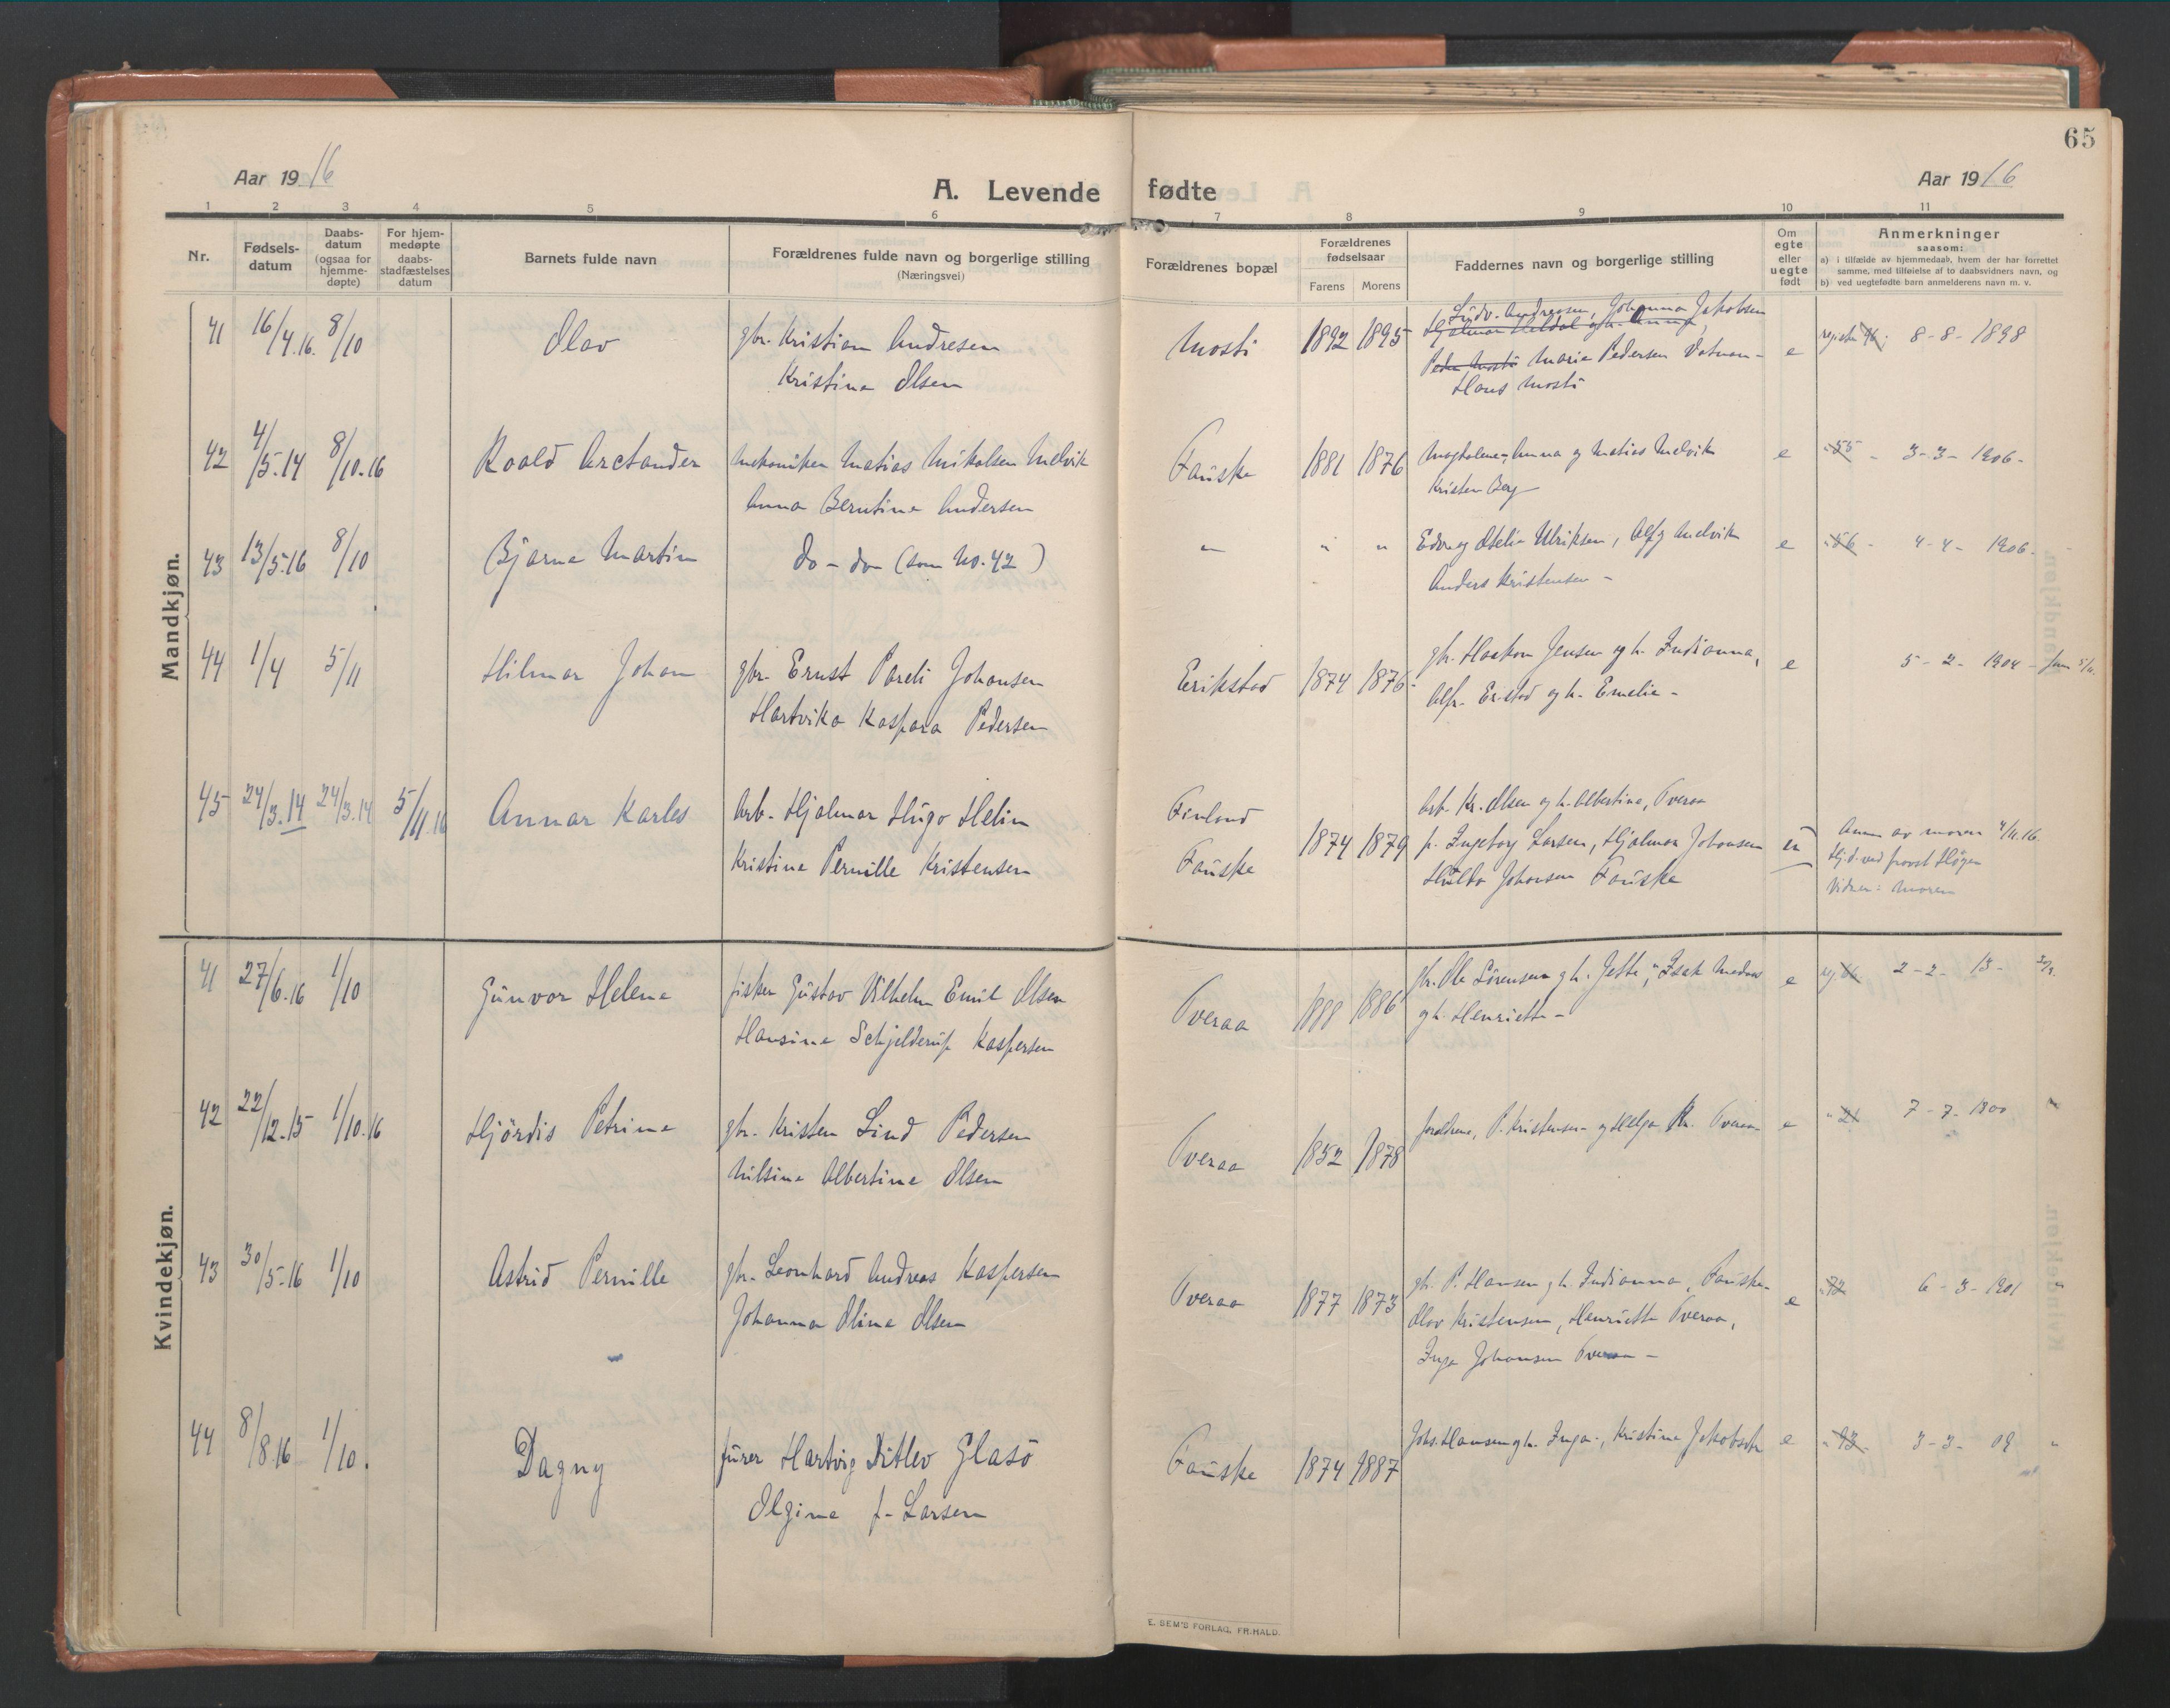 SAT, Ministerialprotokoller, klokkerbøker og fødselsregistre - Nordland, 849/L0698: Ministerialbok nr. 849A09, 1911-1924, s. 65